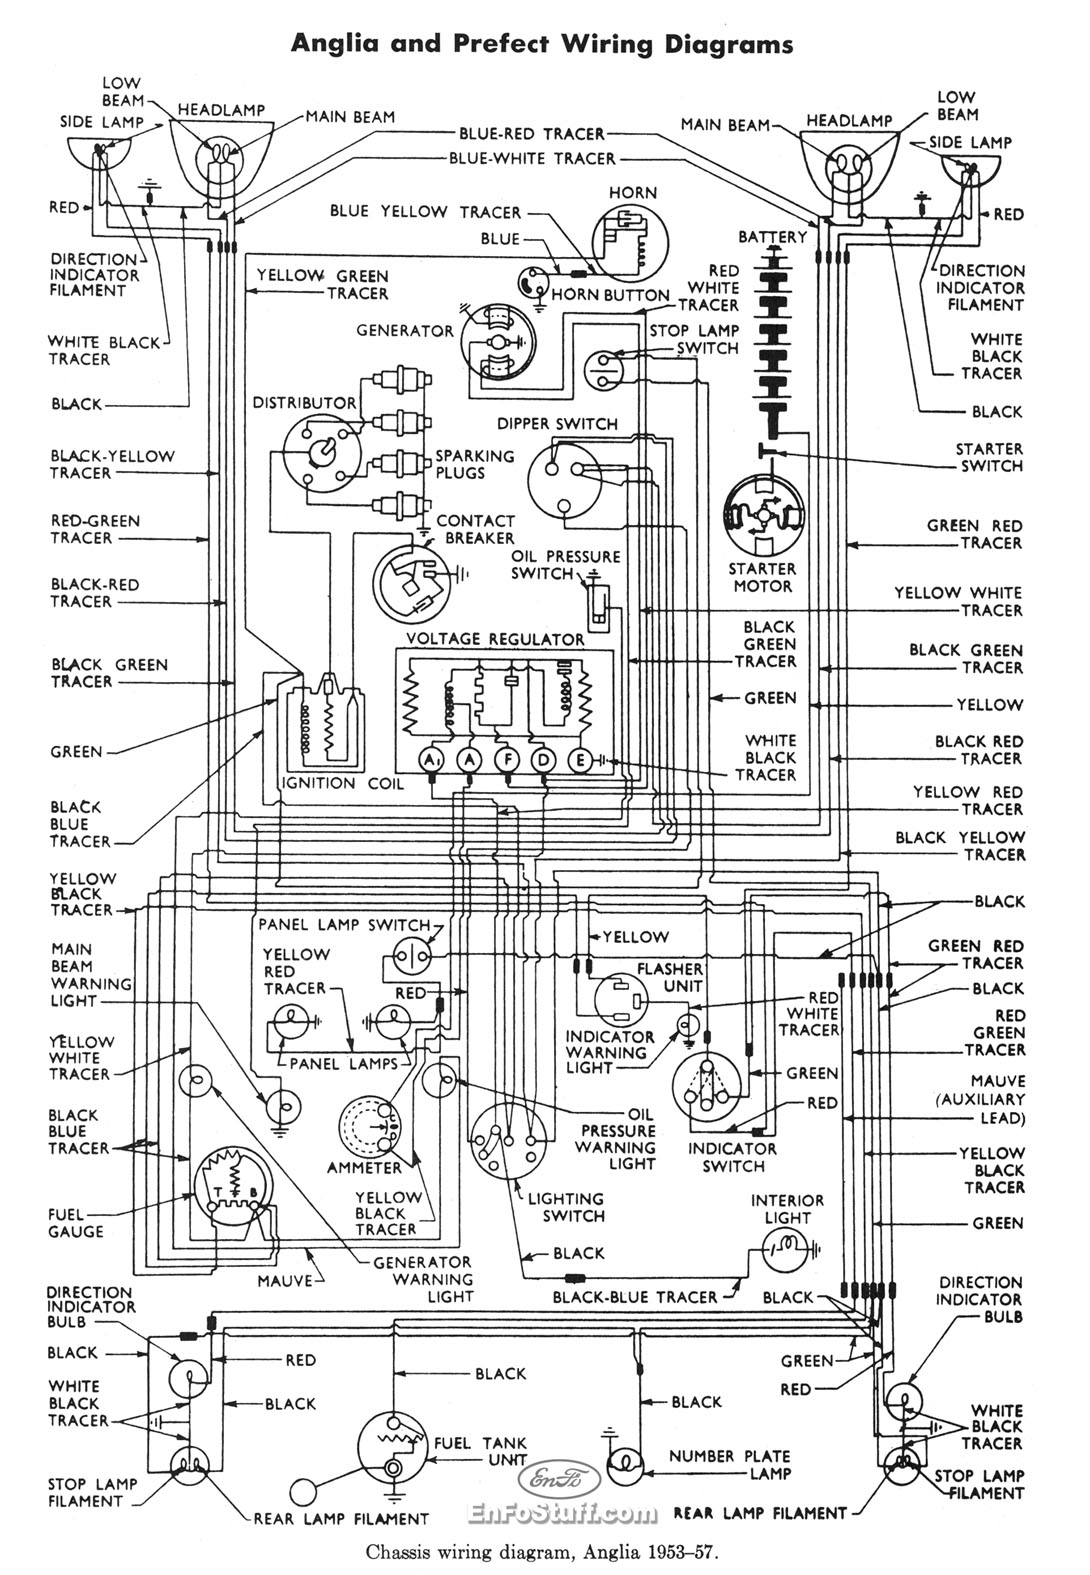 [CSDW_4250]   Master Electronics Repair !: FORD-ANGLIA-1953-57 WIRING DIAGRAM FOR FORD  4000 TRACTOR | Ford Tractor Wiring Diagram 4000 |  | Master Electronics Repair - blogger